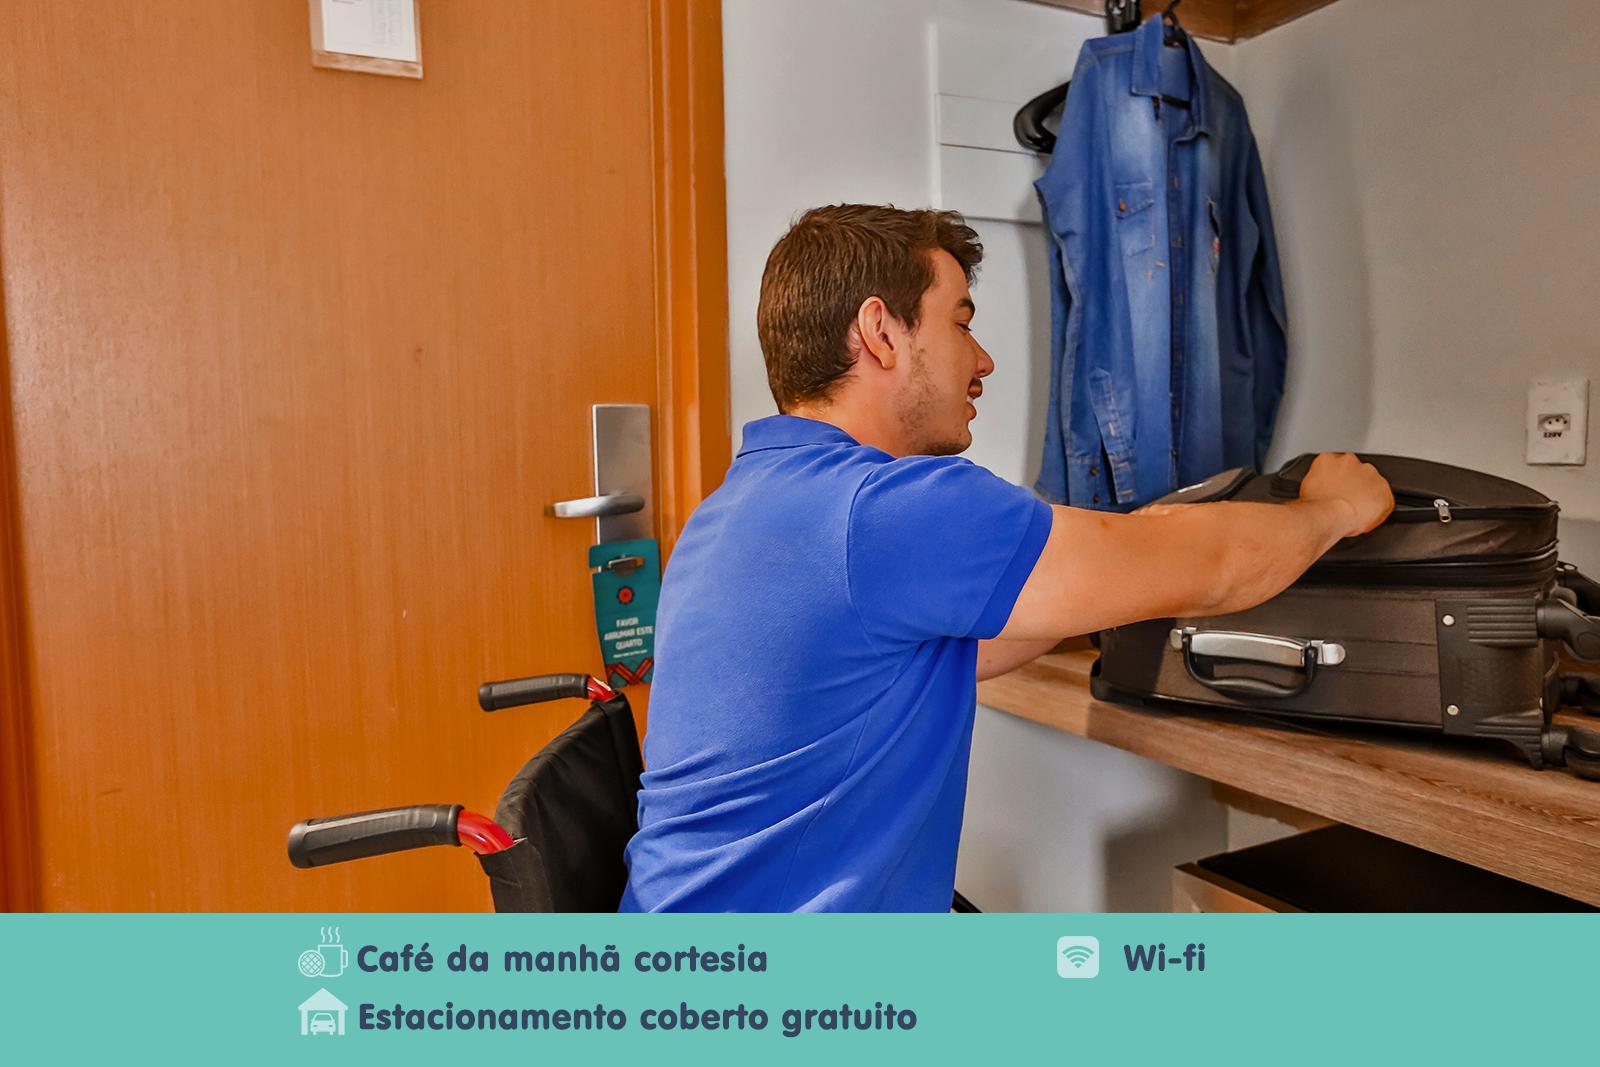 STANDARD ROOM – ADAPTADO 1 CAMA DE CASAL - MEGA MODA HOTEL GOIÂNIA